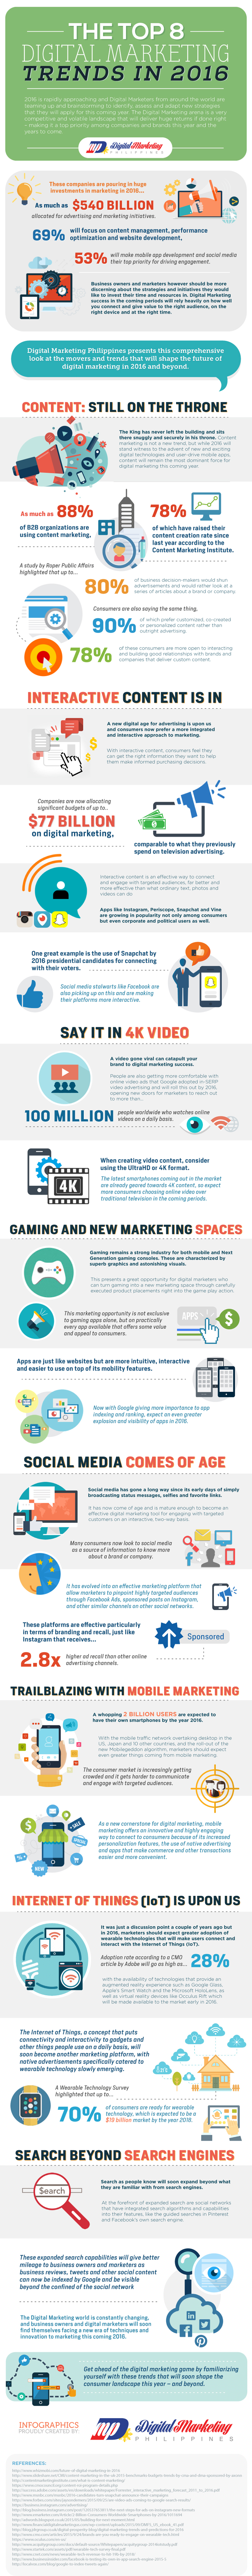 Digital-Marketing-Trends-in-2016